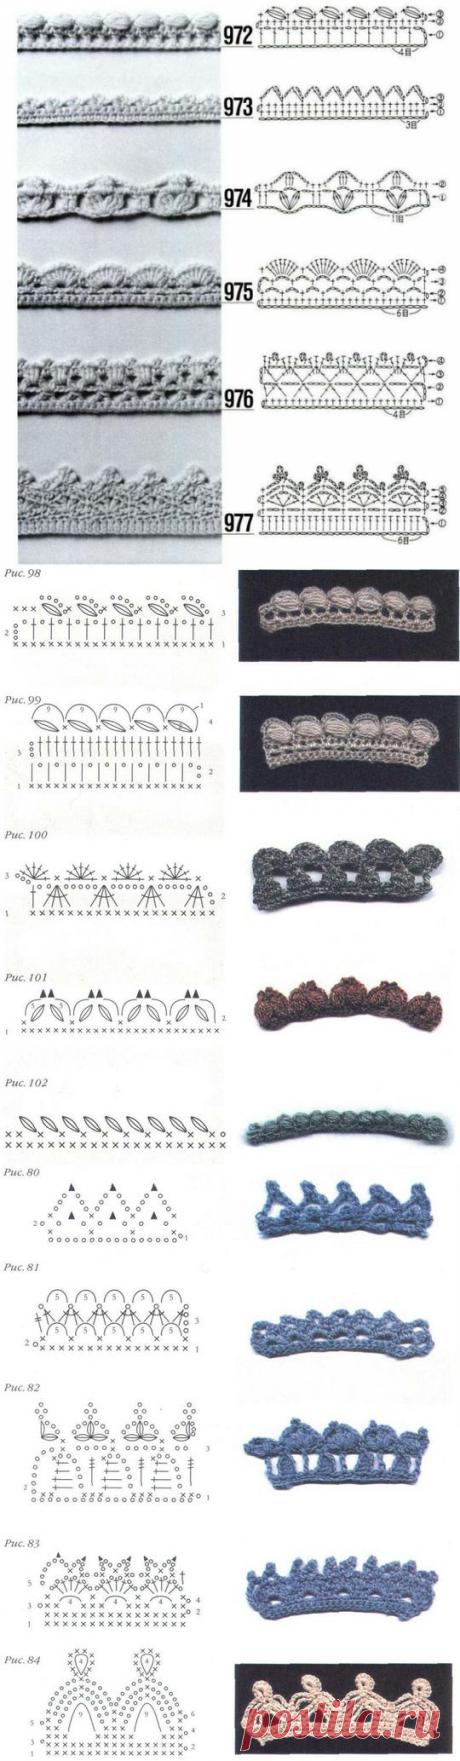 Декоративная обвязка края изделия крючком - olga_tarasik